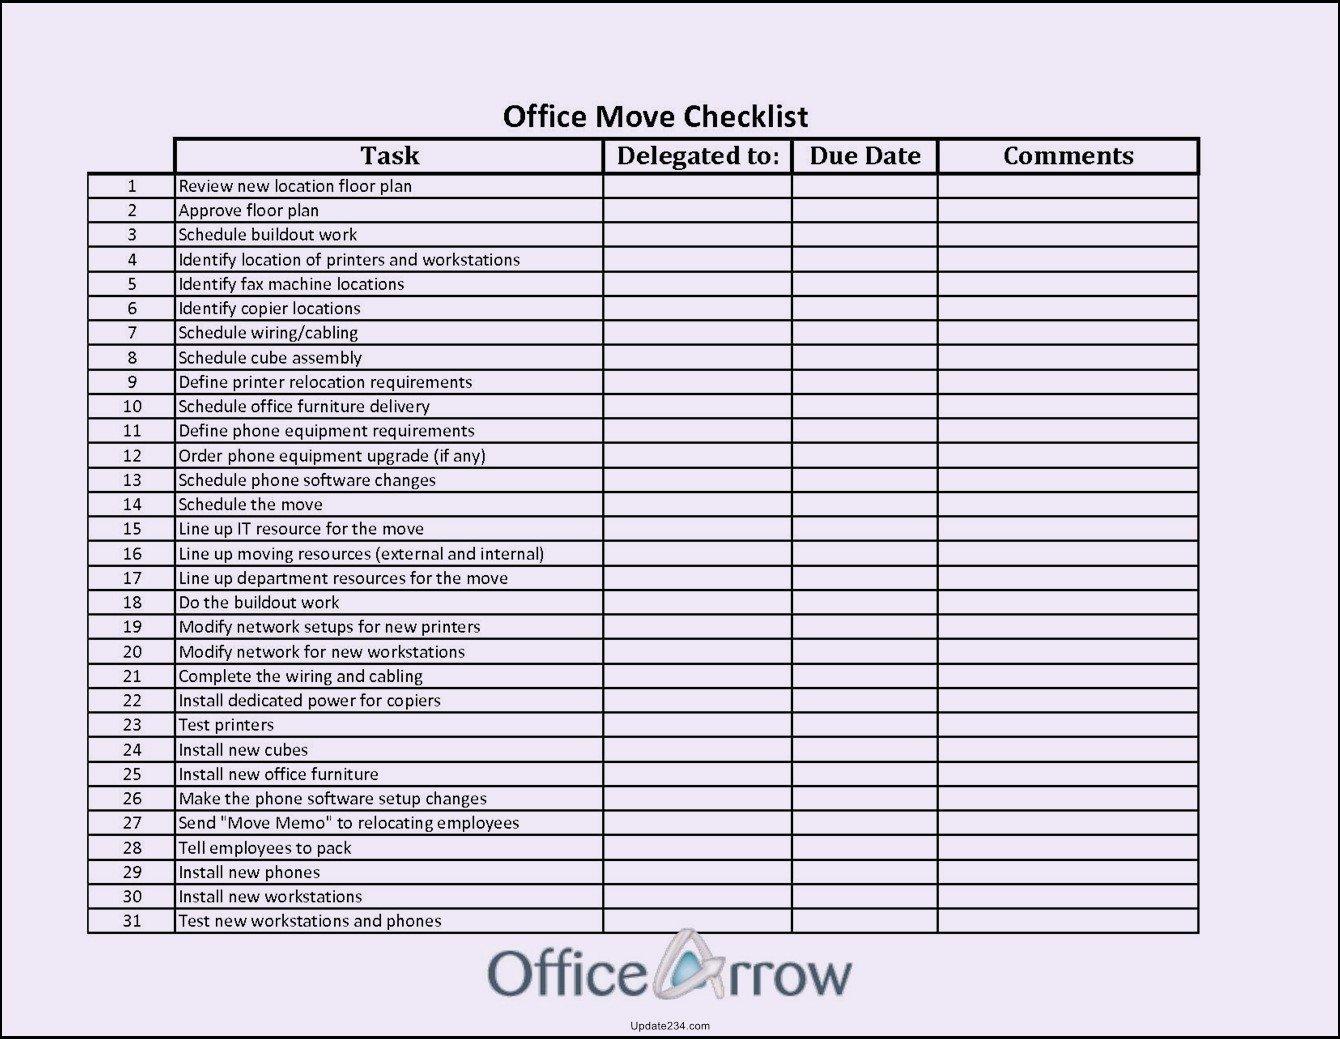 Microsoft Office Check Template Elegant Fice Move Checklist Template Excel Template Update234